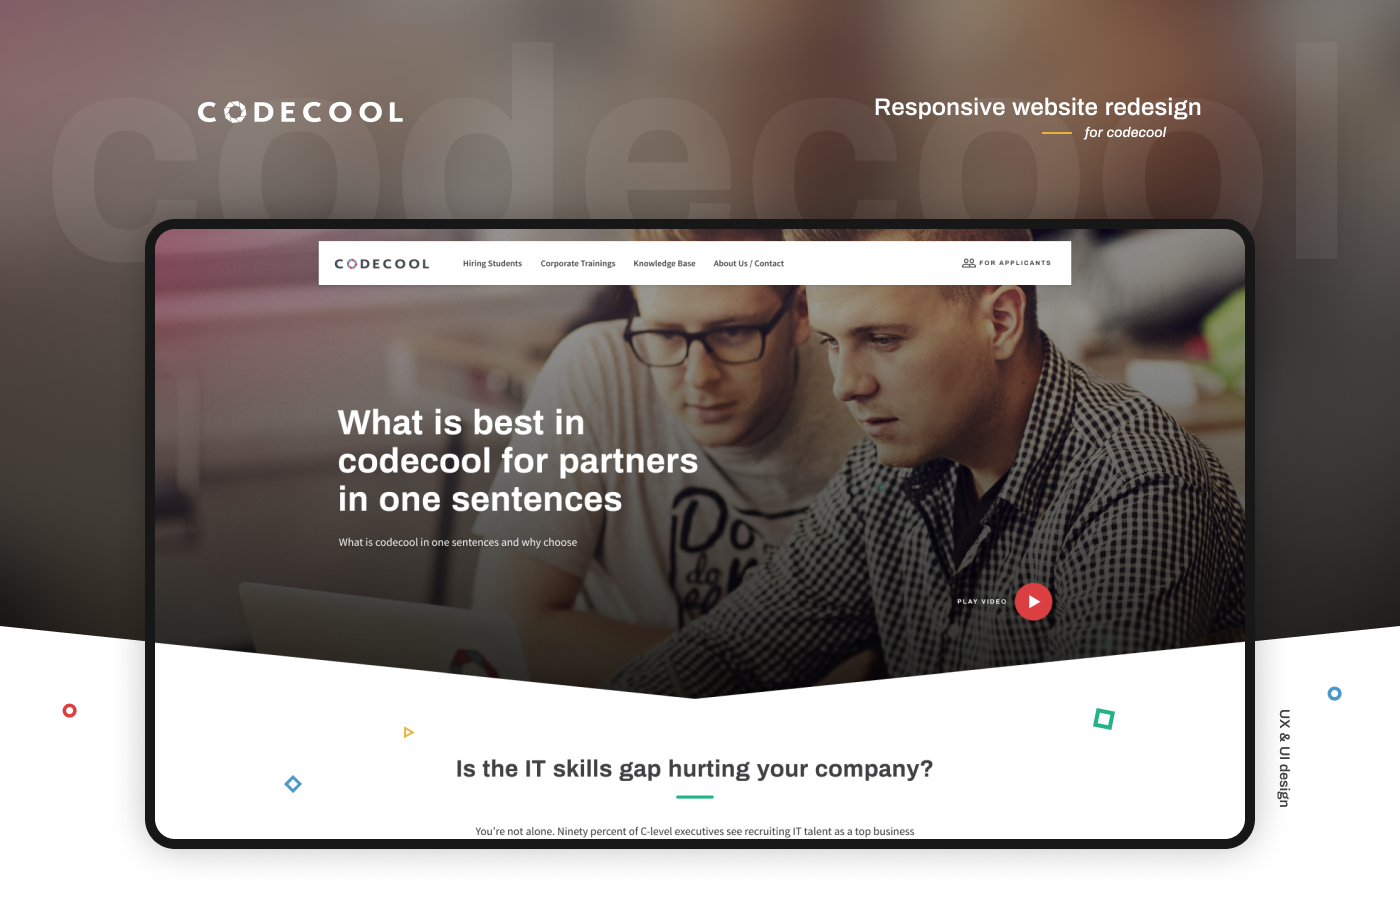 Responsive rwd Web Design  Webdesign Education course programming  school Web code